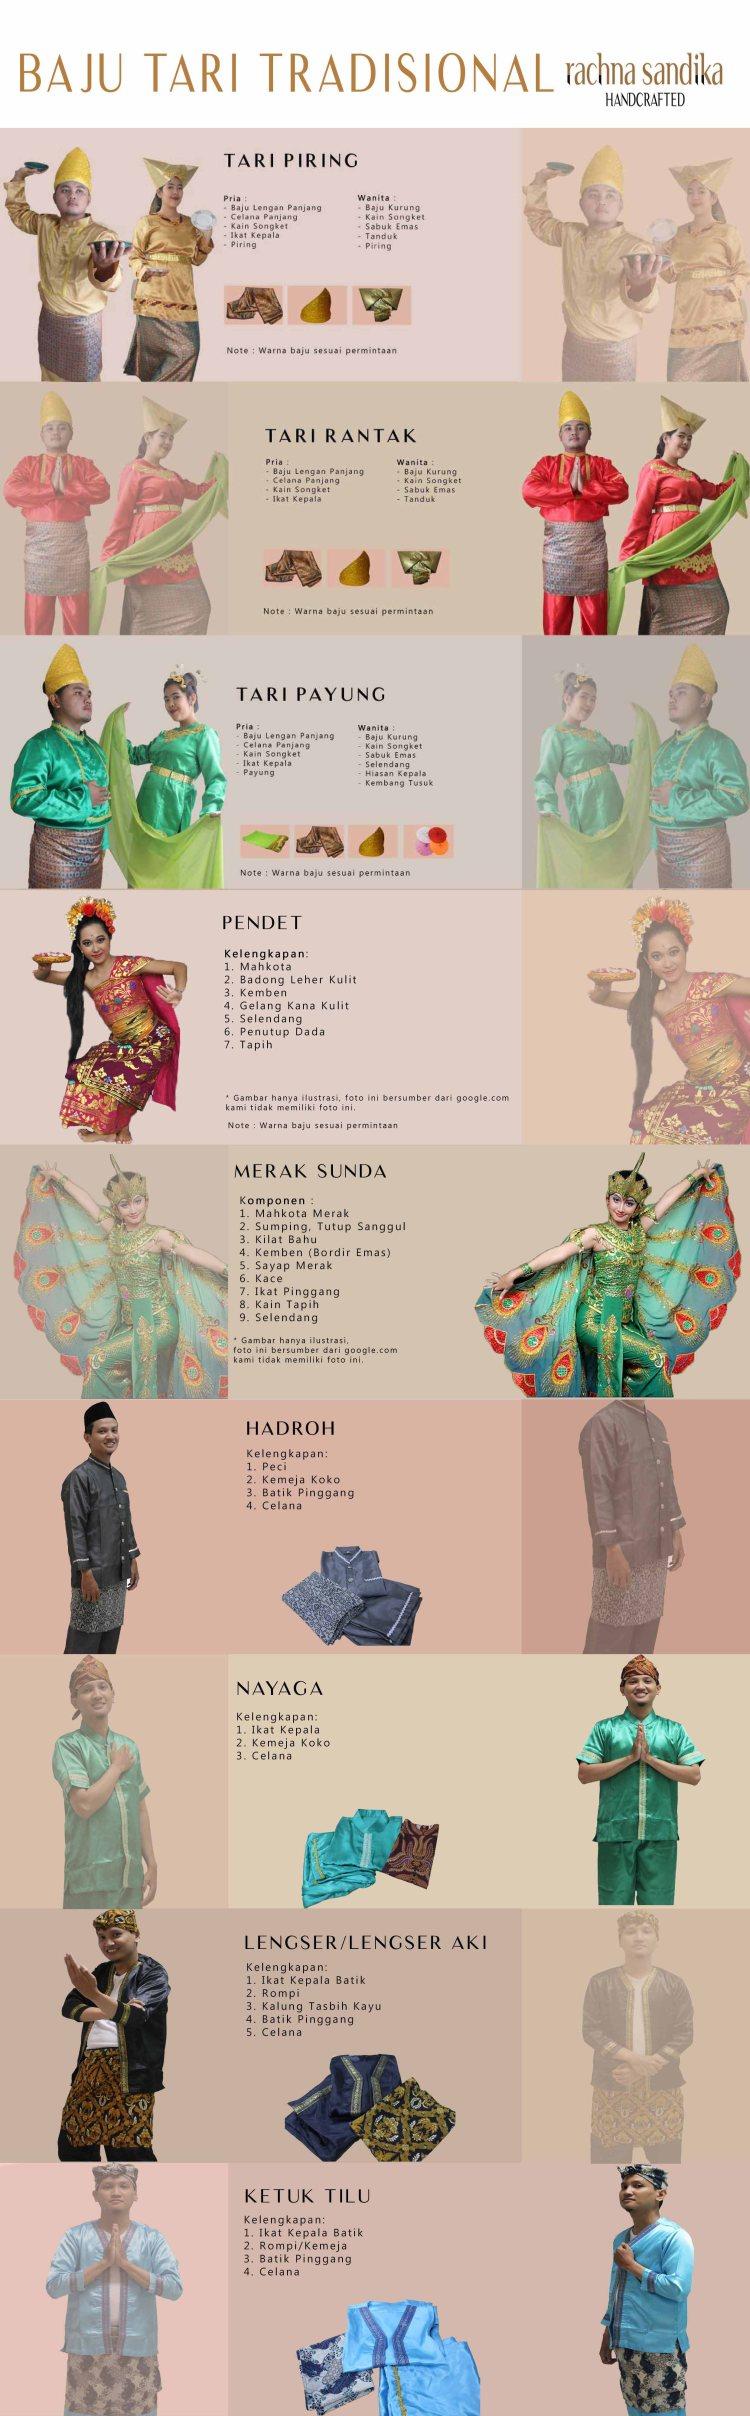 Flyer Baju Tari Tradisional Rachna Sandika 1